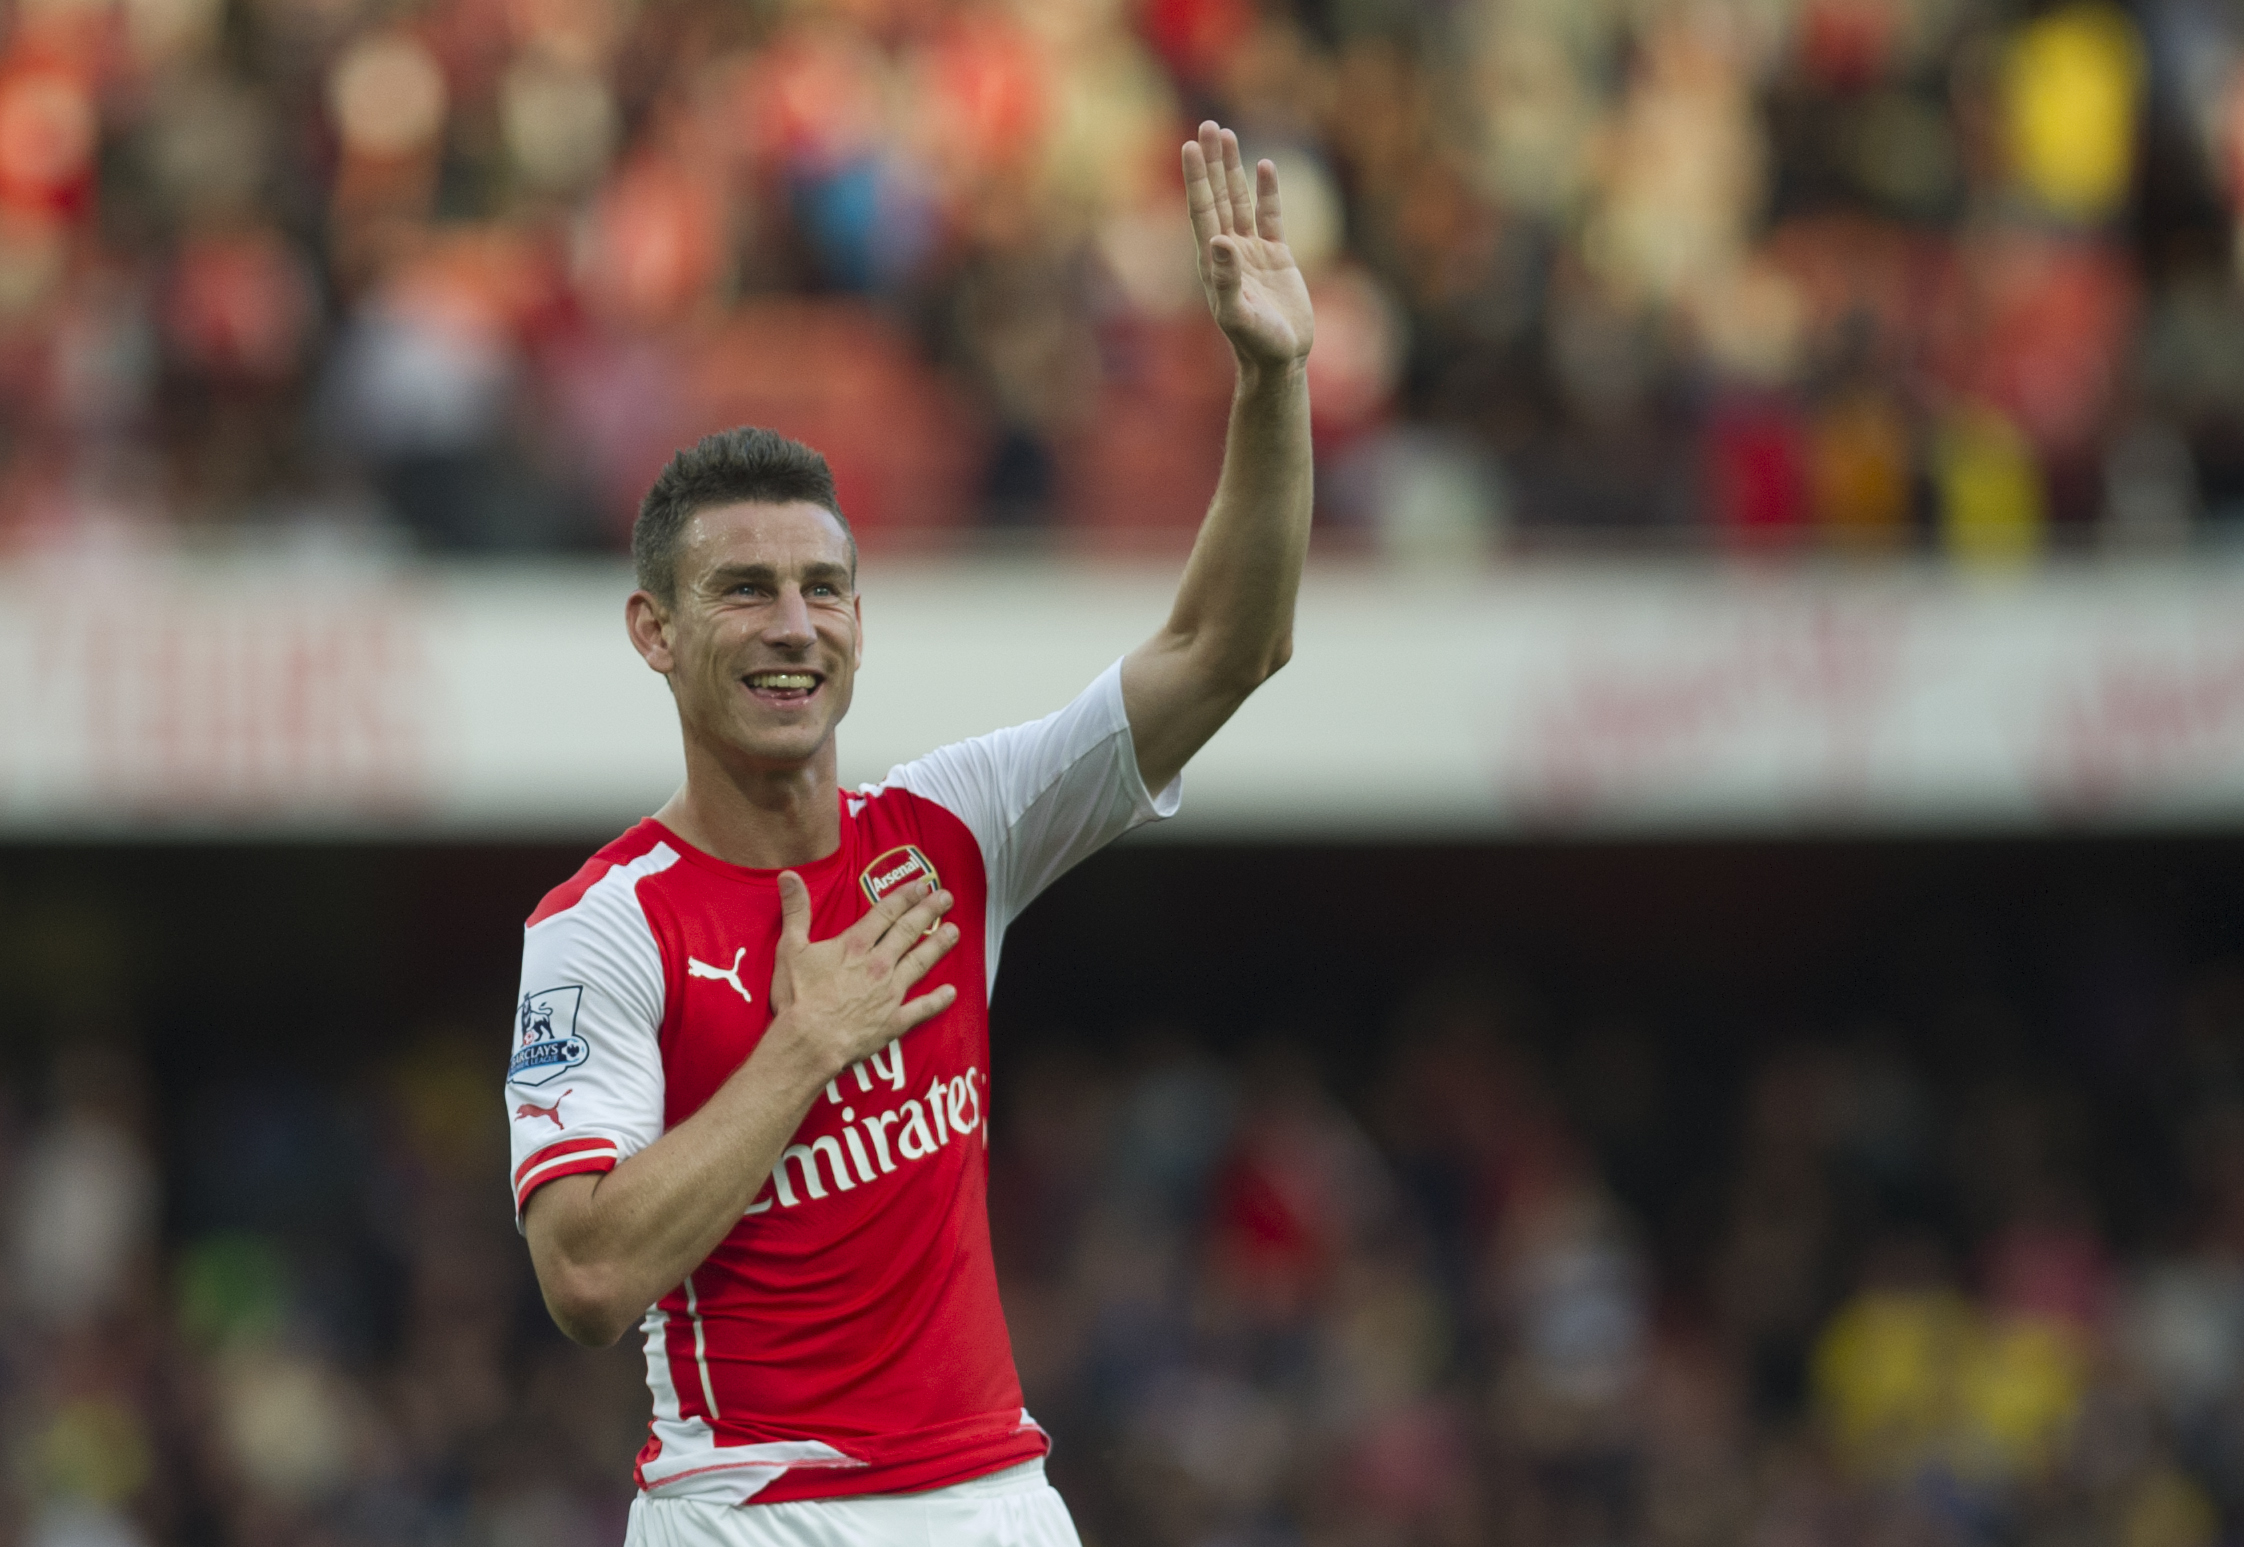 Forget Alexis Sanchez, Laurent Koscielny is Arsenal's most important player